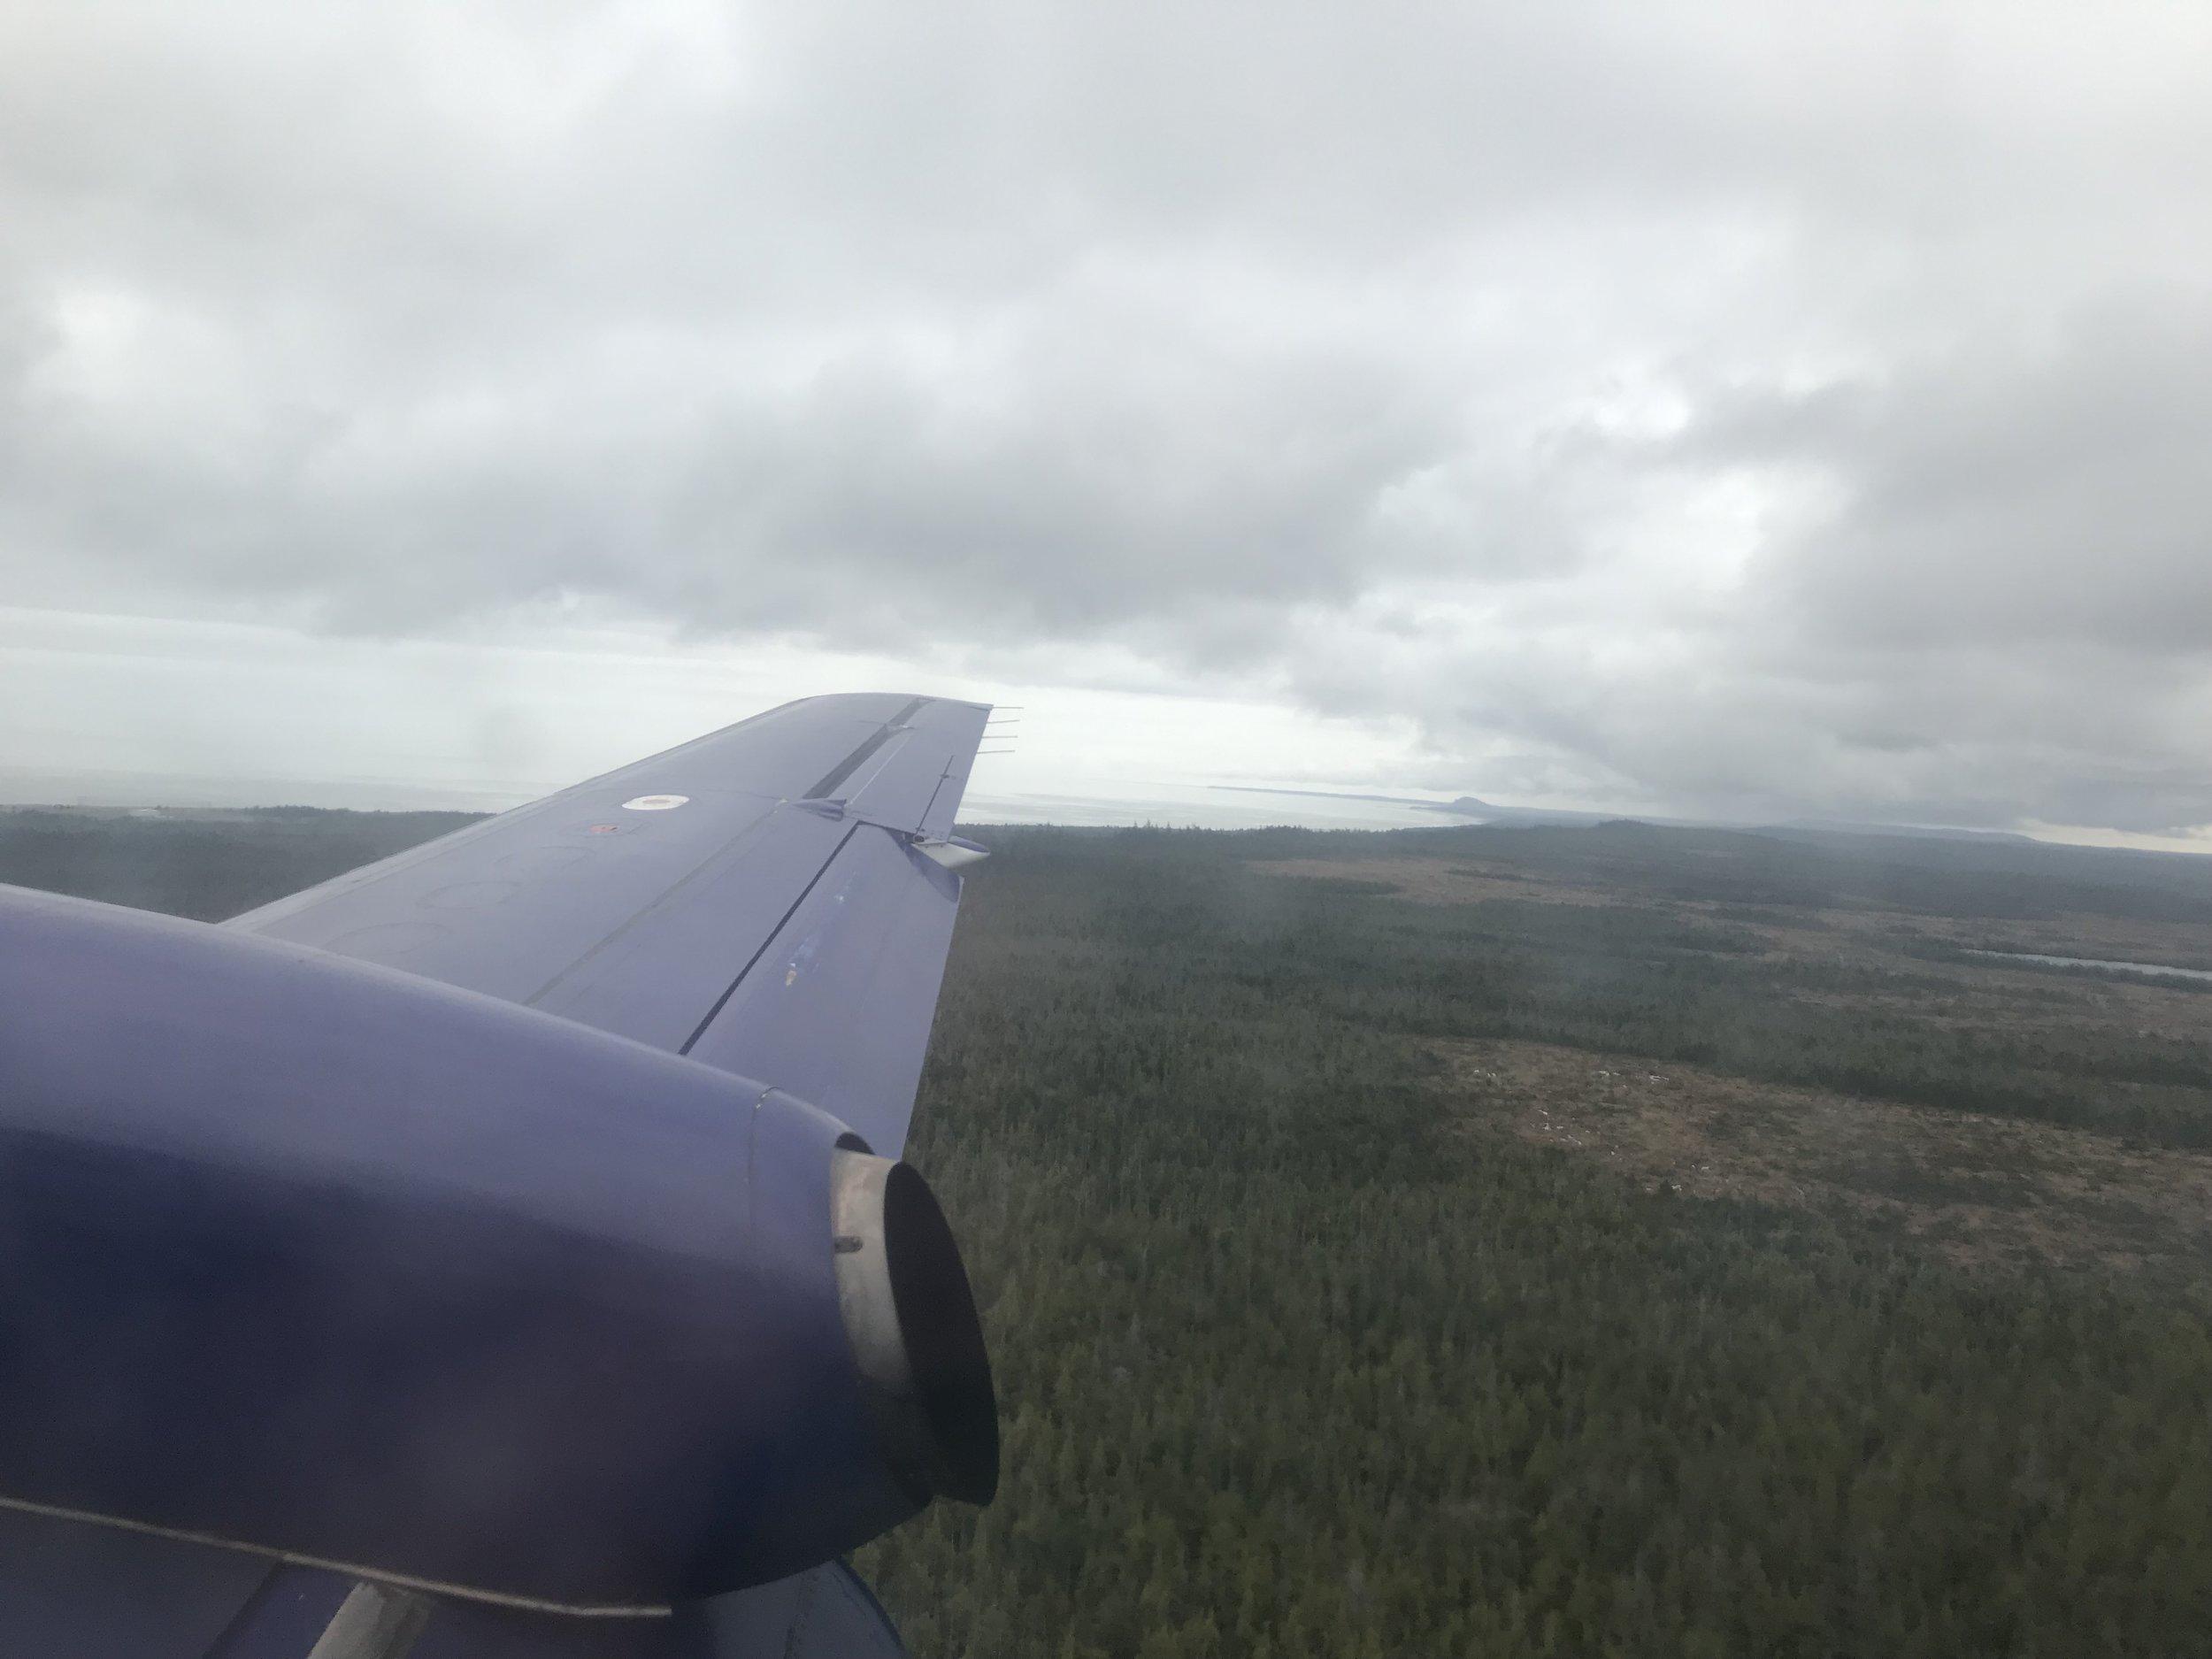 Landing in Masset